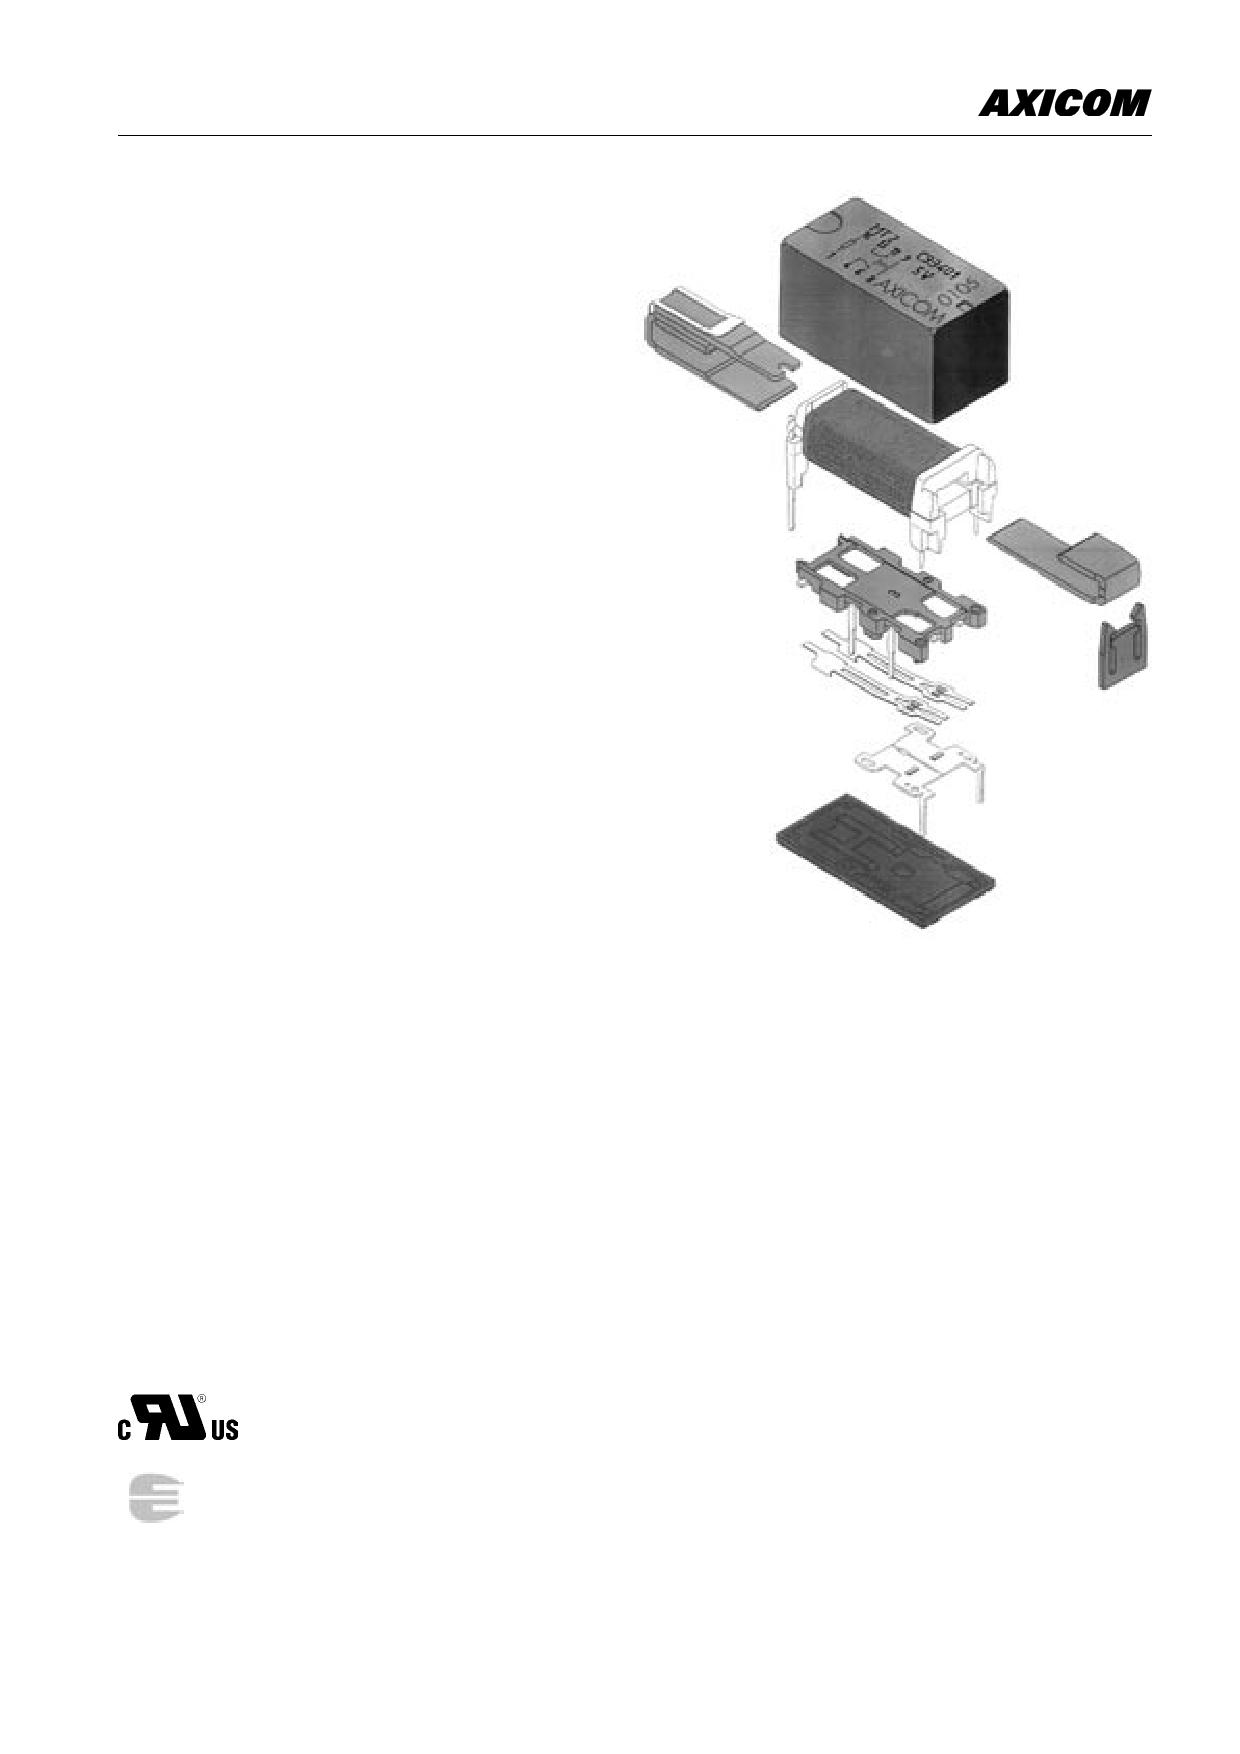 5-1462000-1 Даташит, Описание, Даташиты